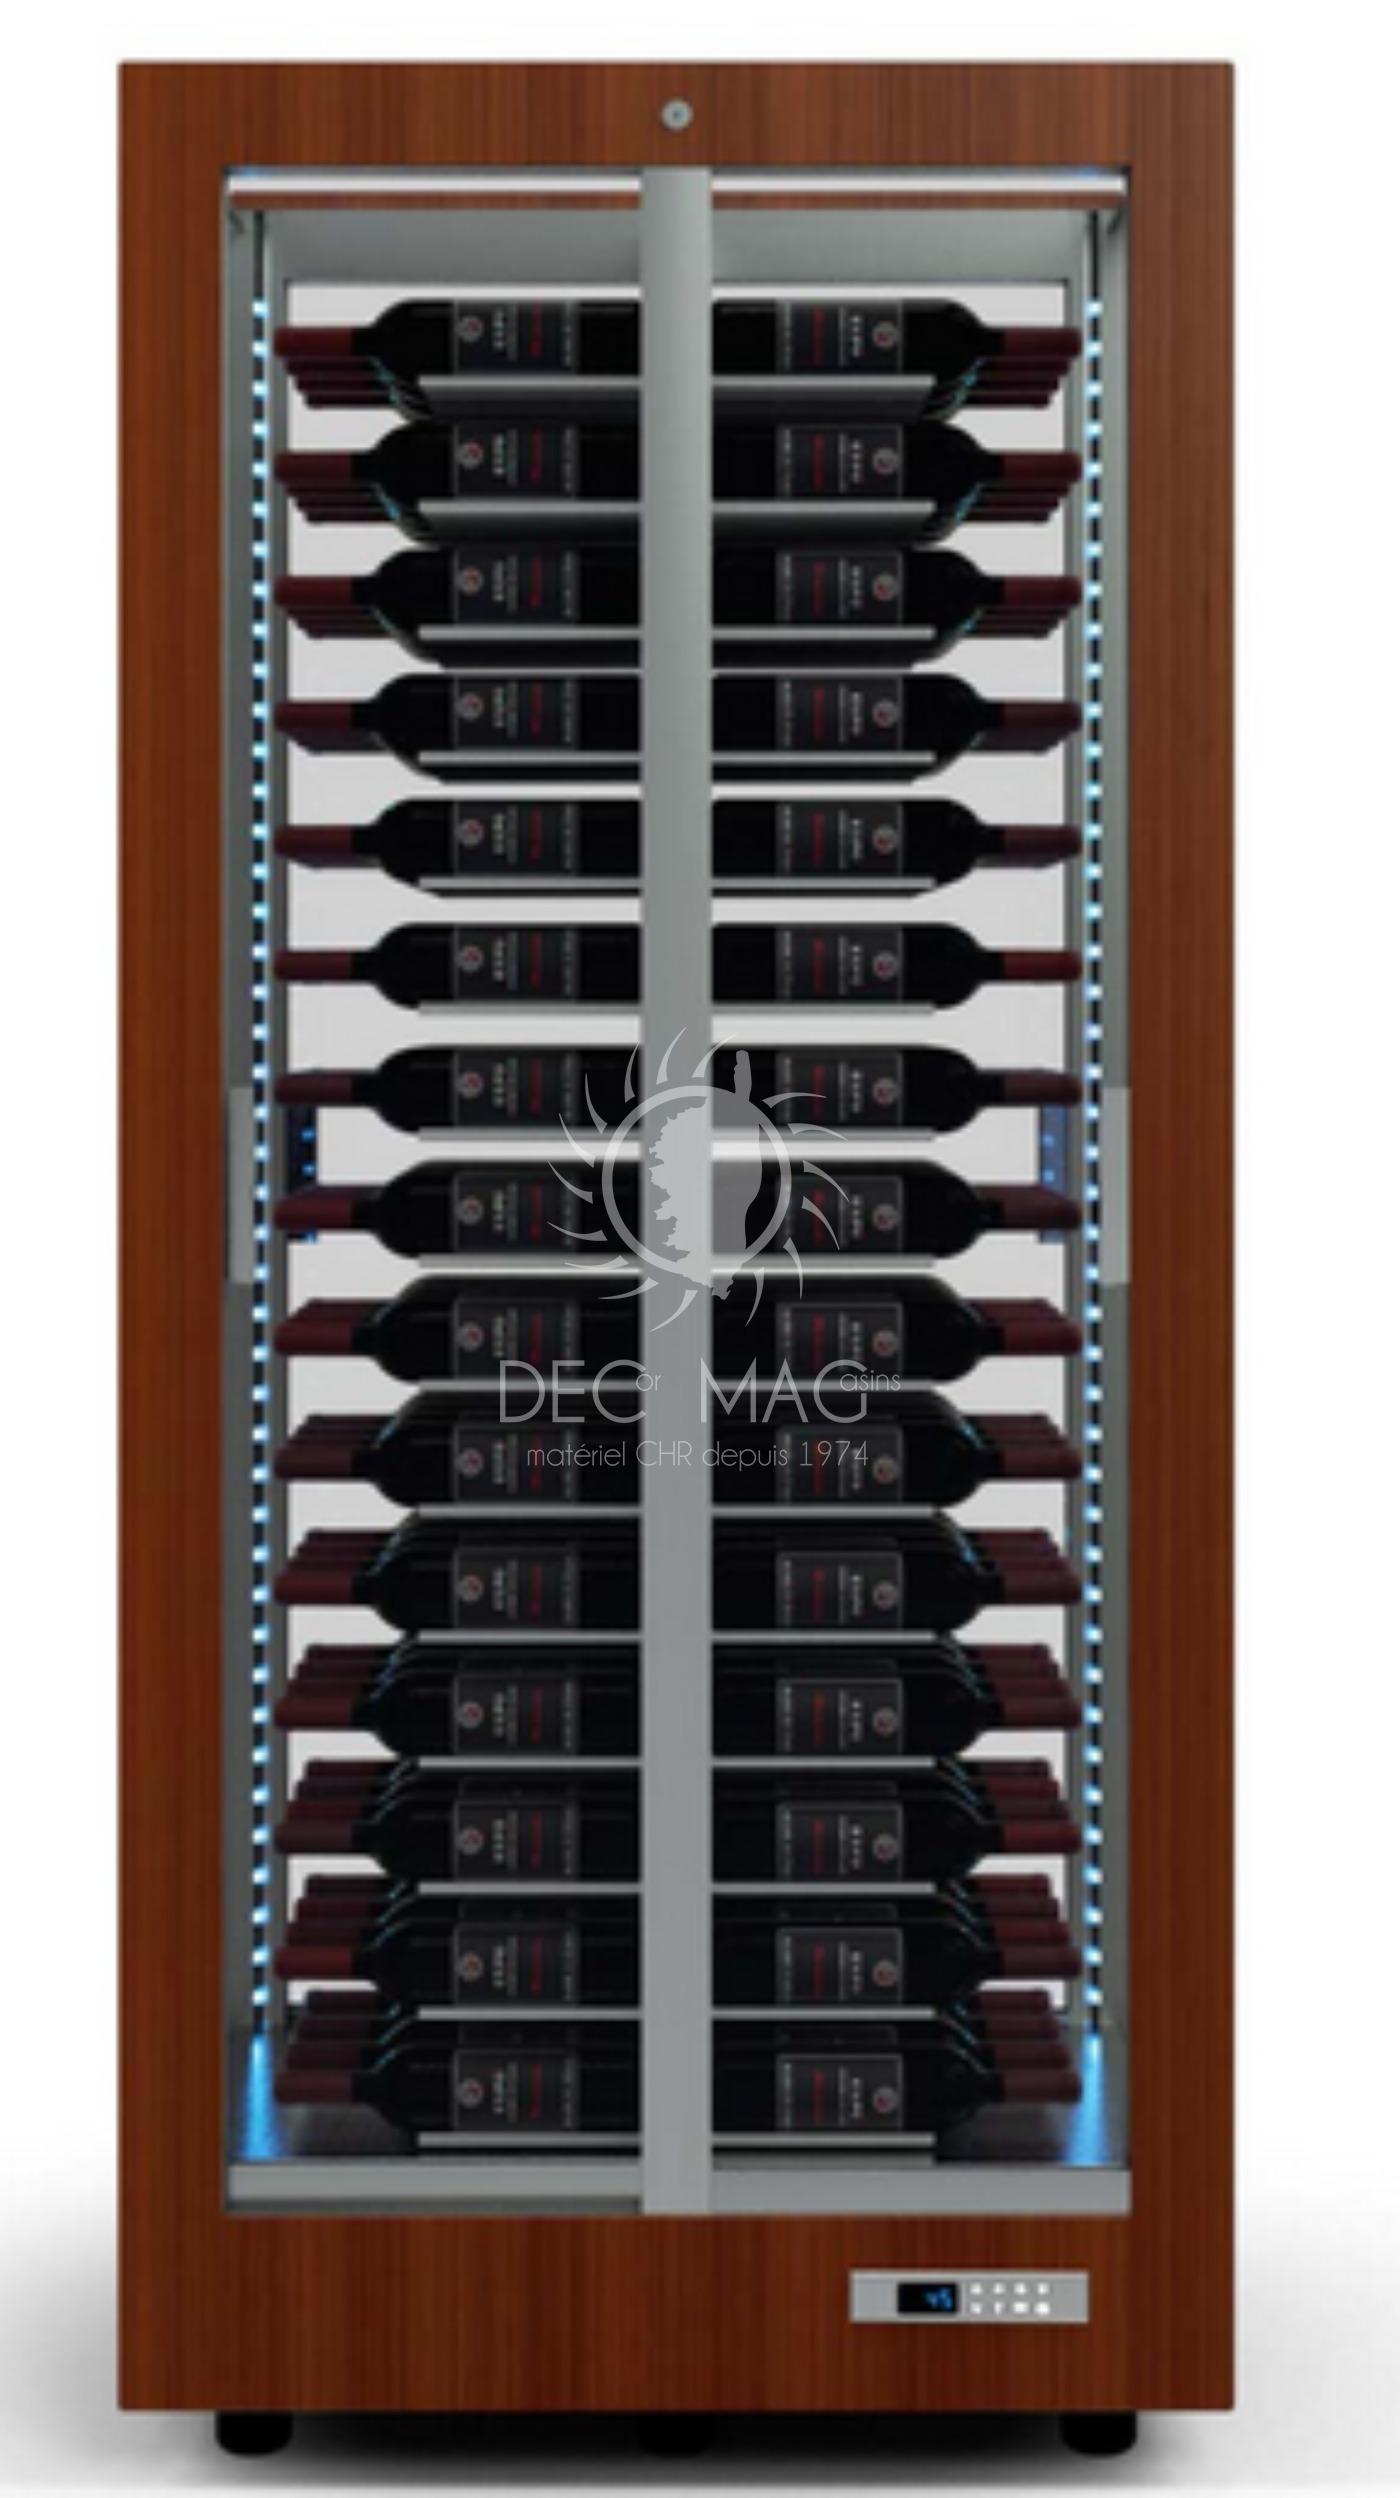 decor magasin vente cave vins sp ciale haute merisier. Black Bedroom Furniture Sets. Home Design Ideas